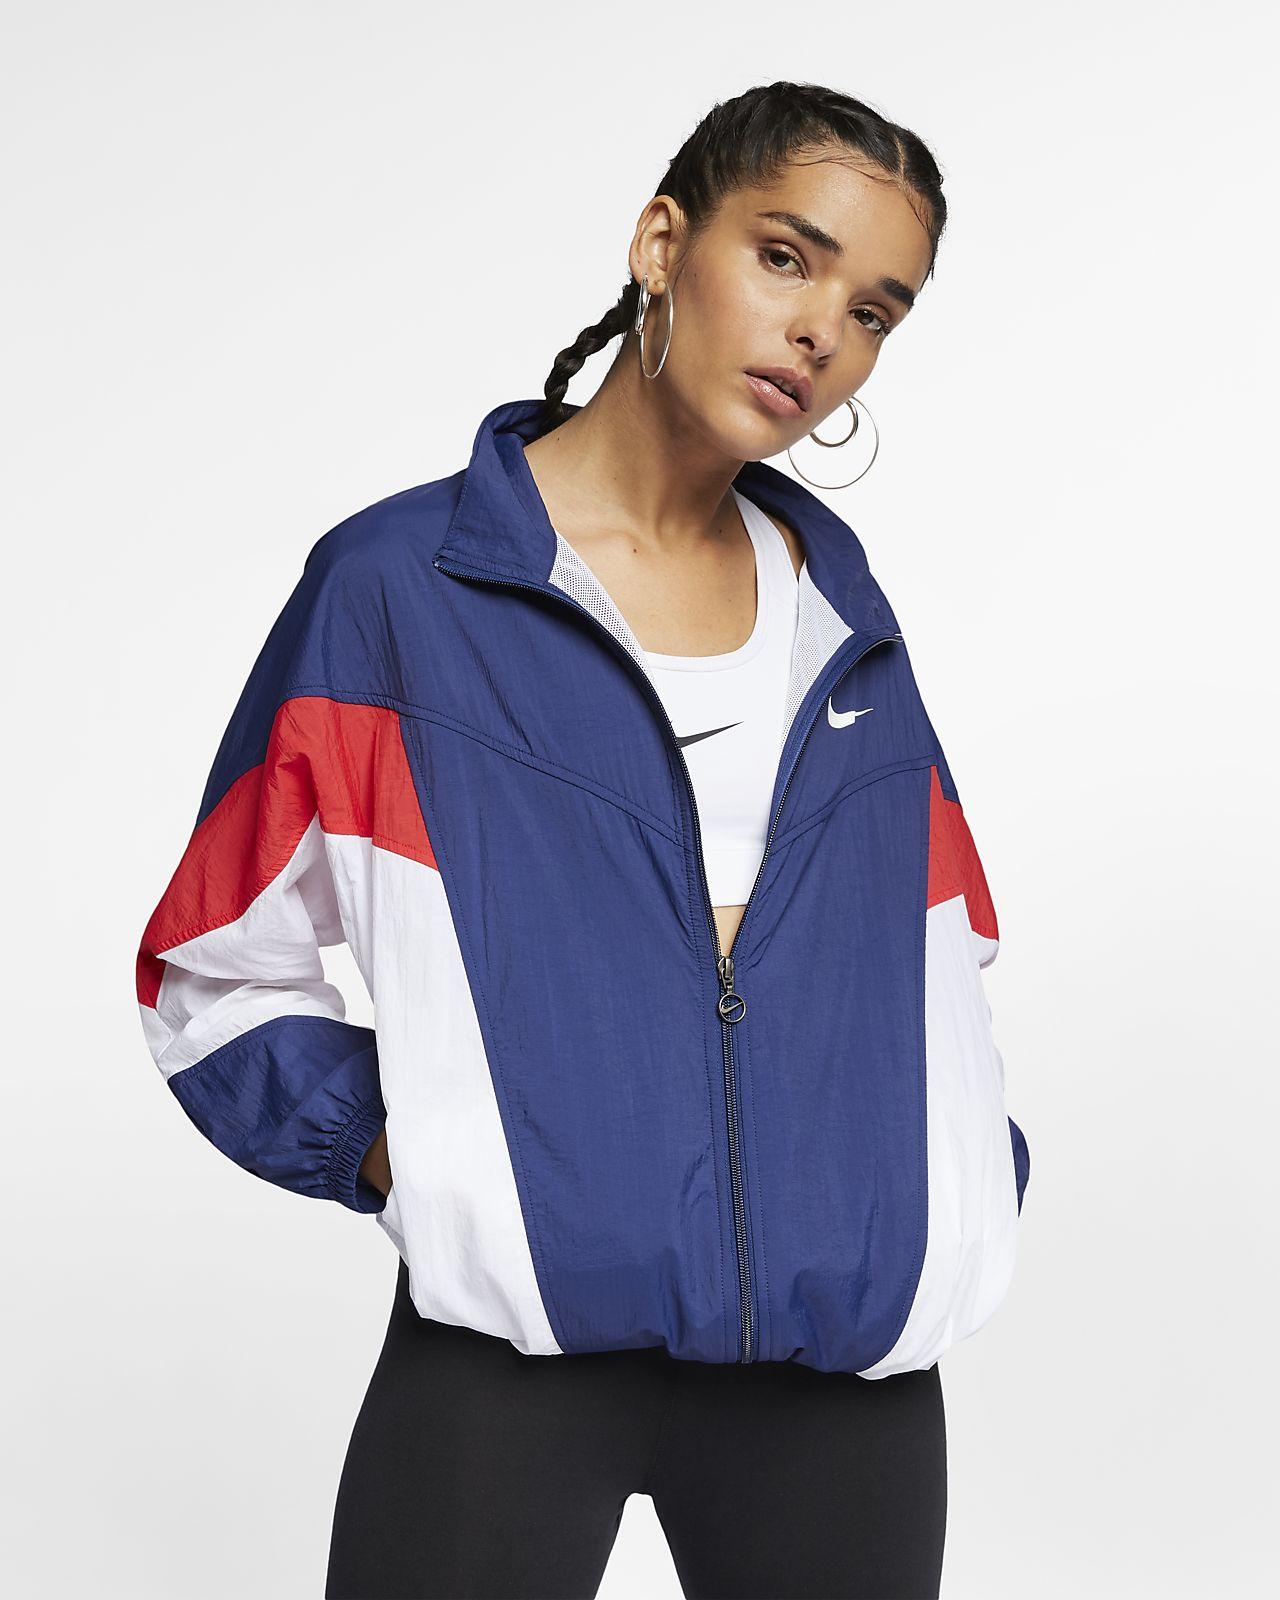 Fr Nike Femme Sportswear Windrunner Veste Pour XSxCz6F dfe358dbb896